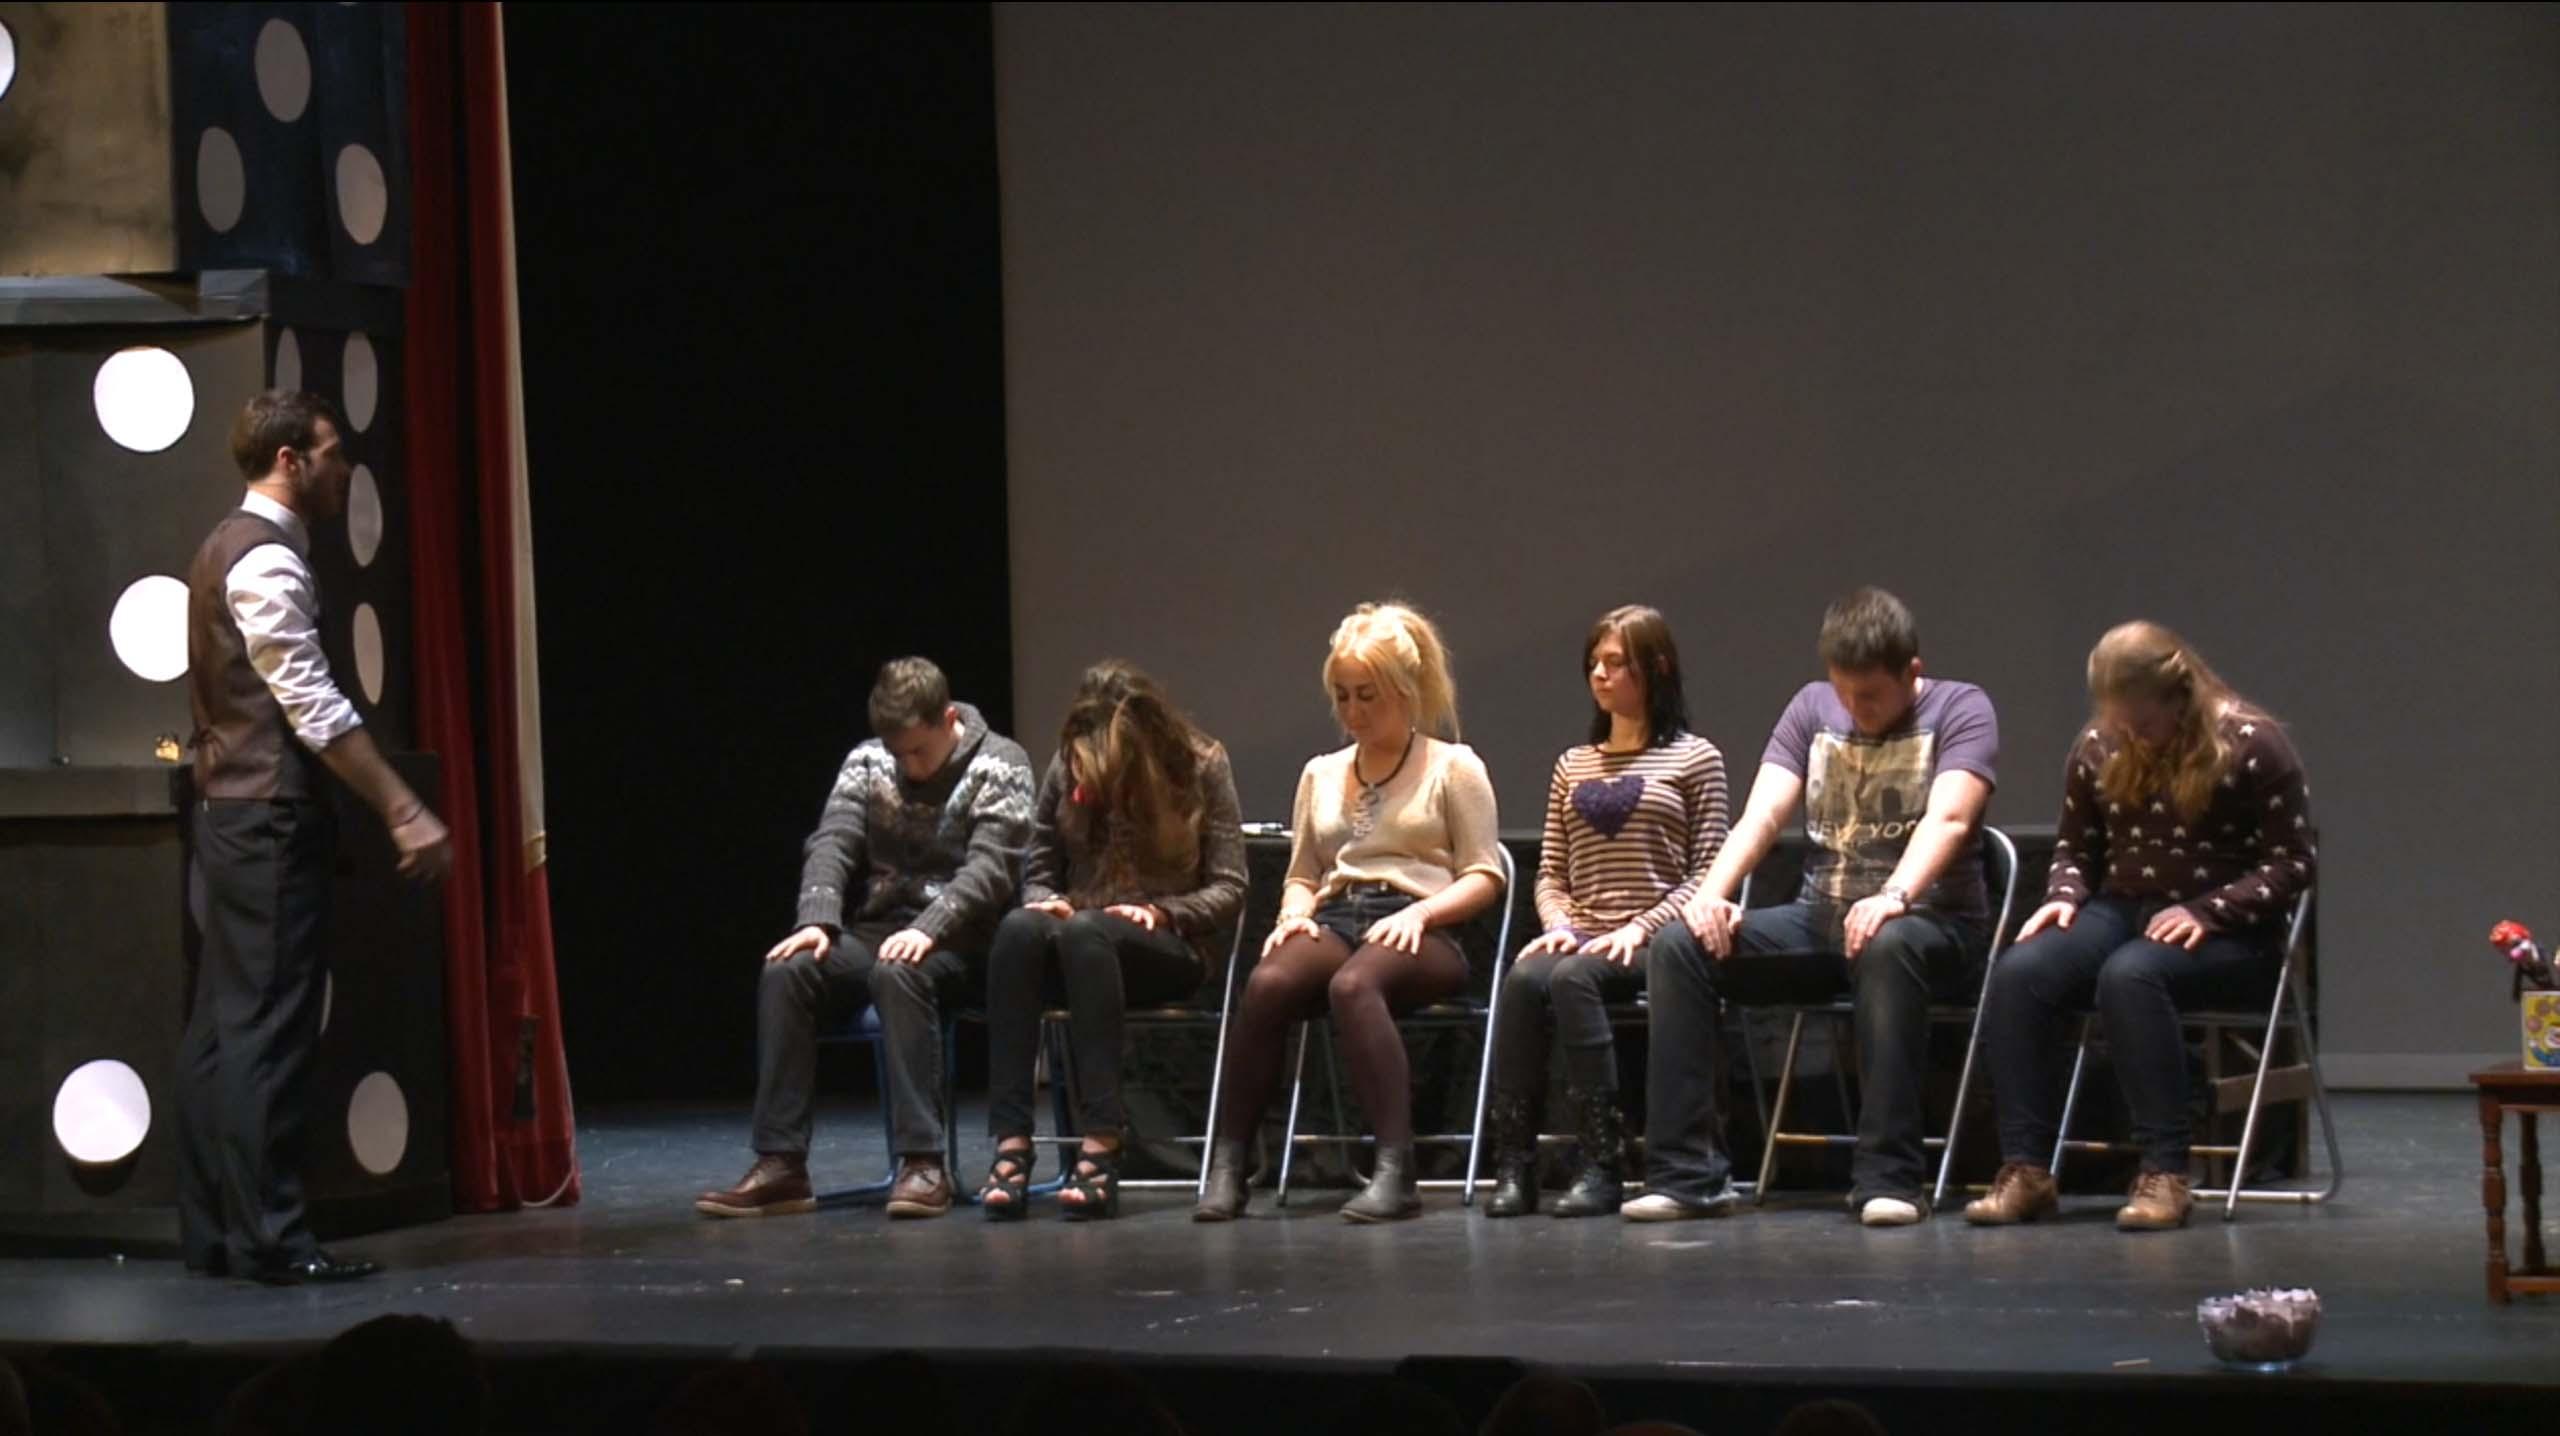 MIND GAMES theatre volunteers hypnotised on stage